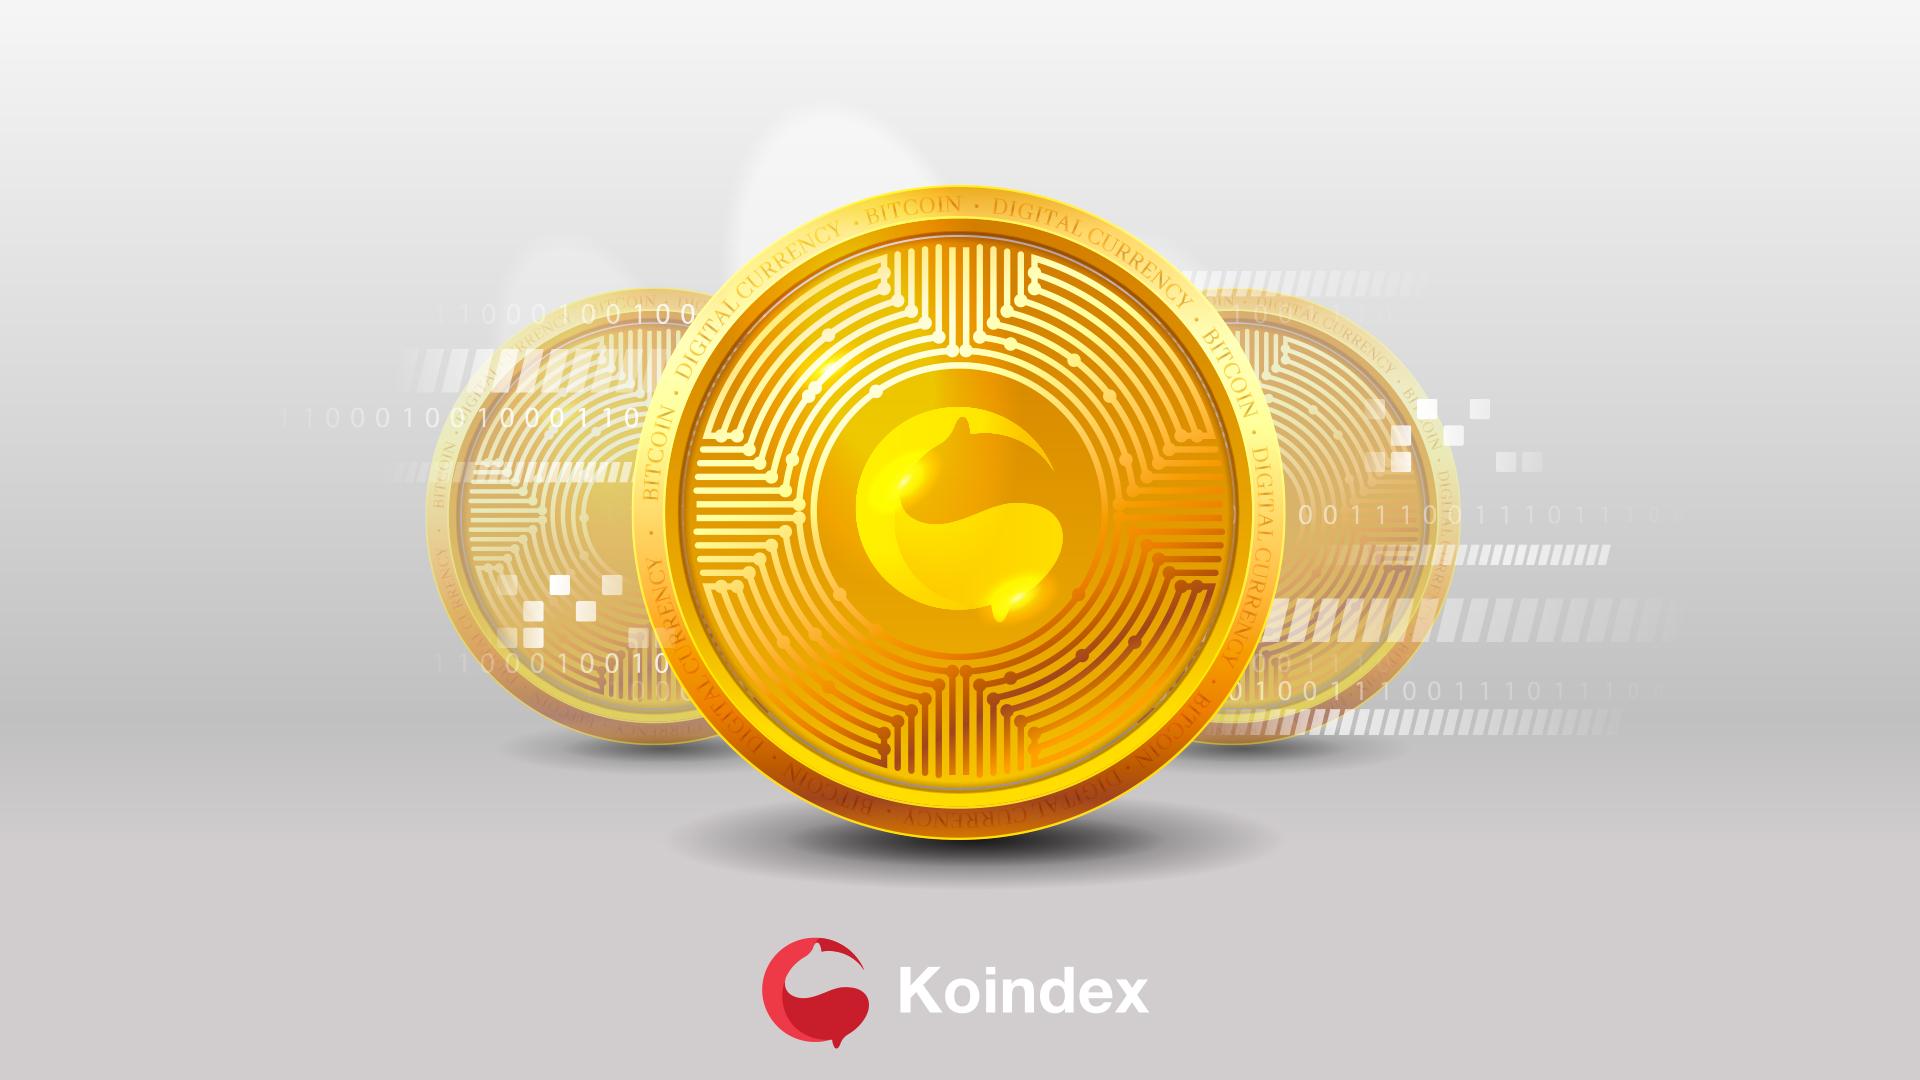 Pasar Cryptocurrency Memenuhi Cryptocurrency KOIN Lokal